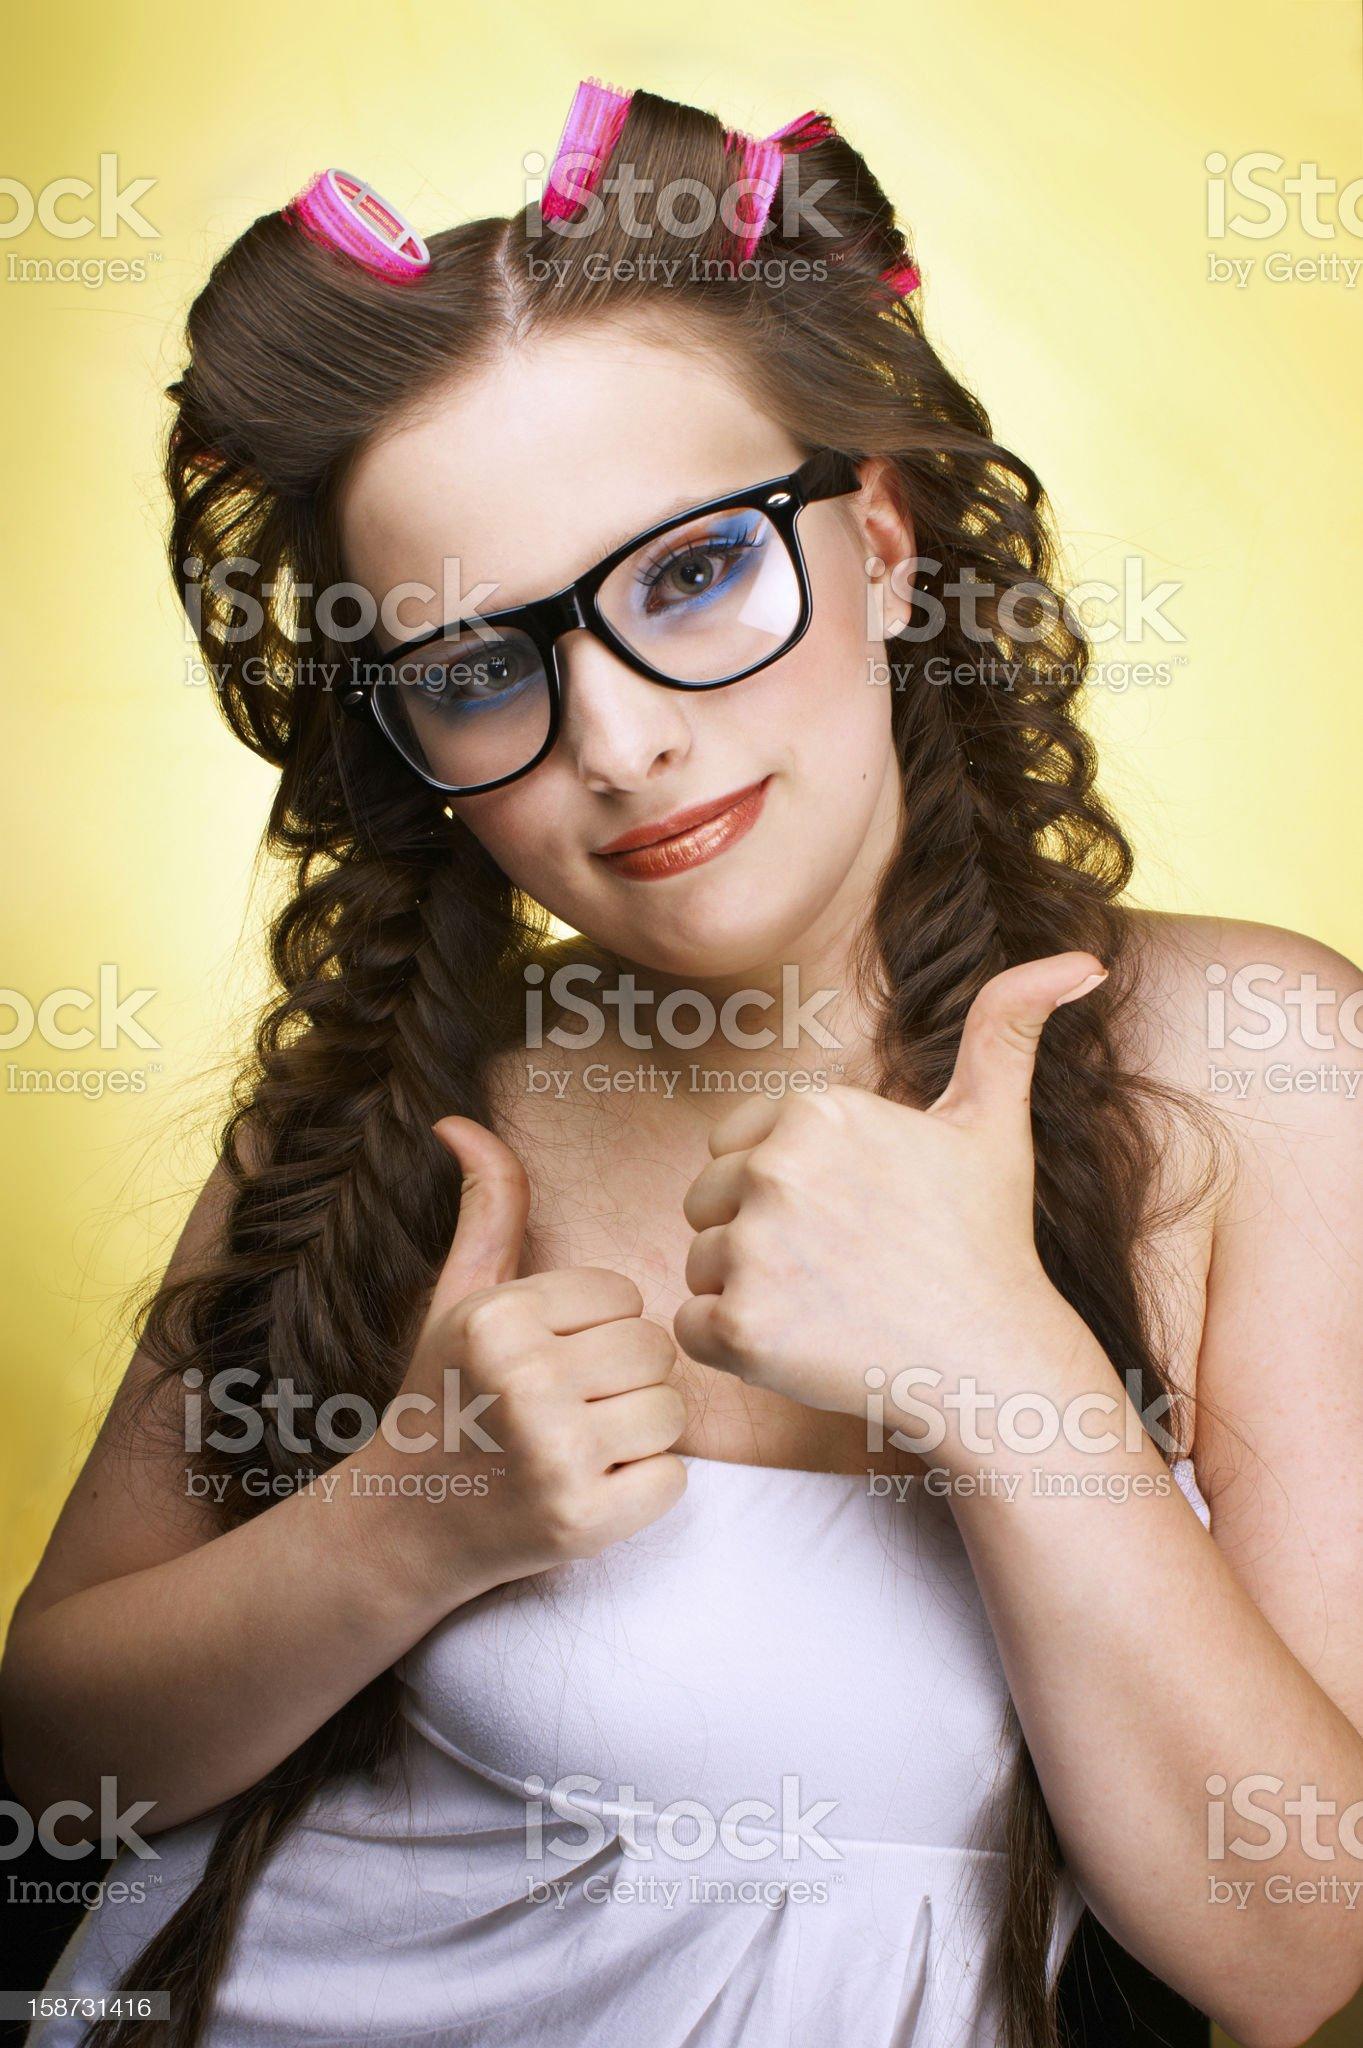 funny teenage royalty-free stock photo